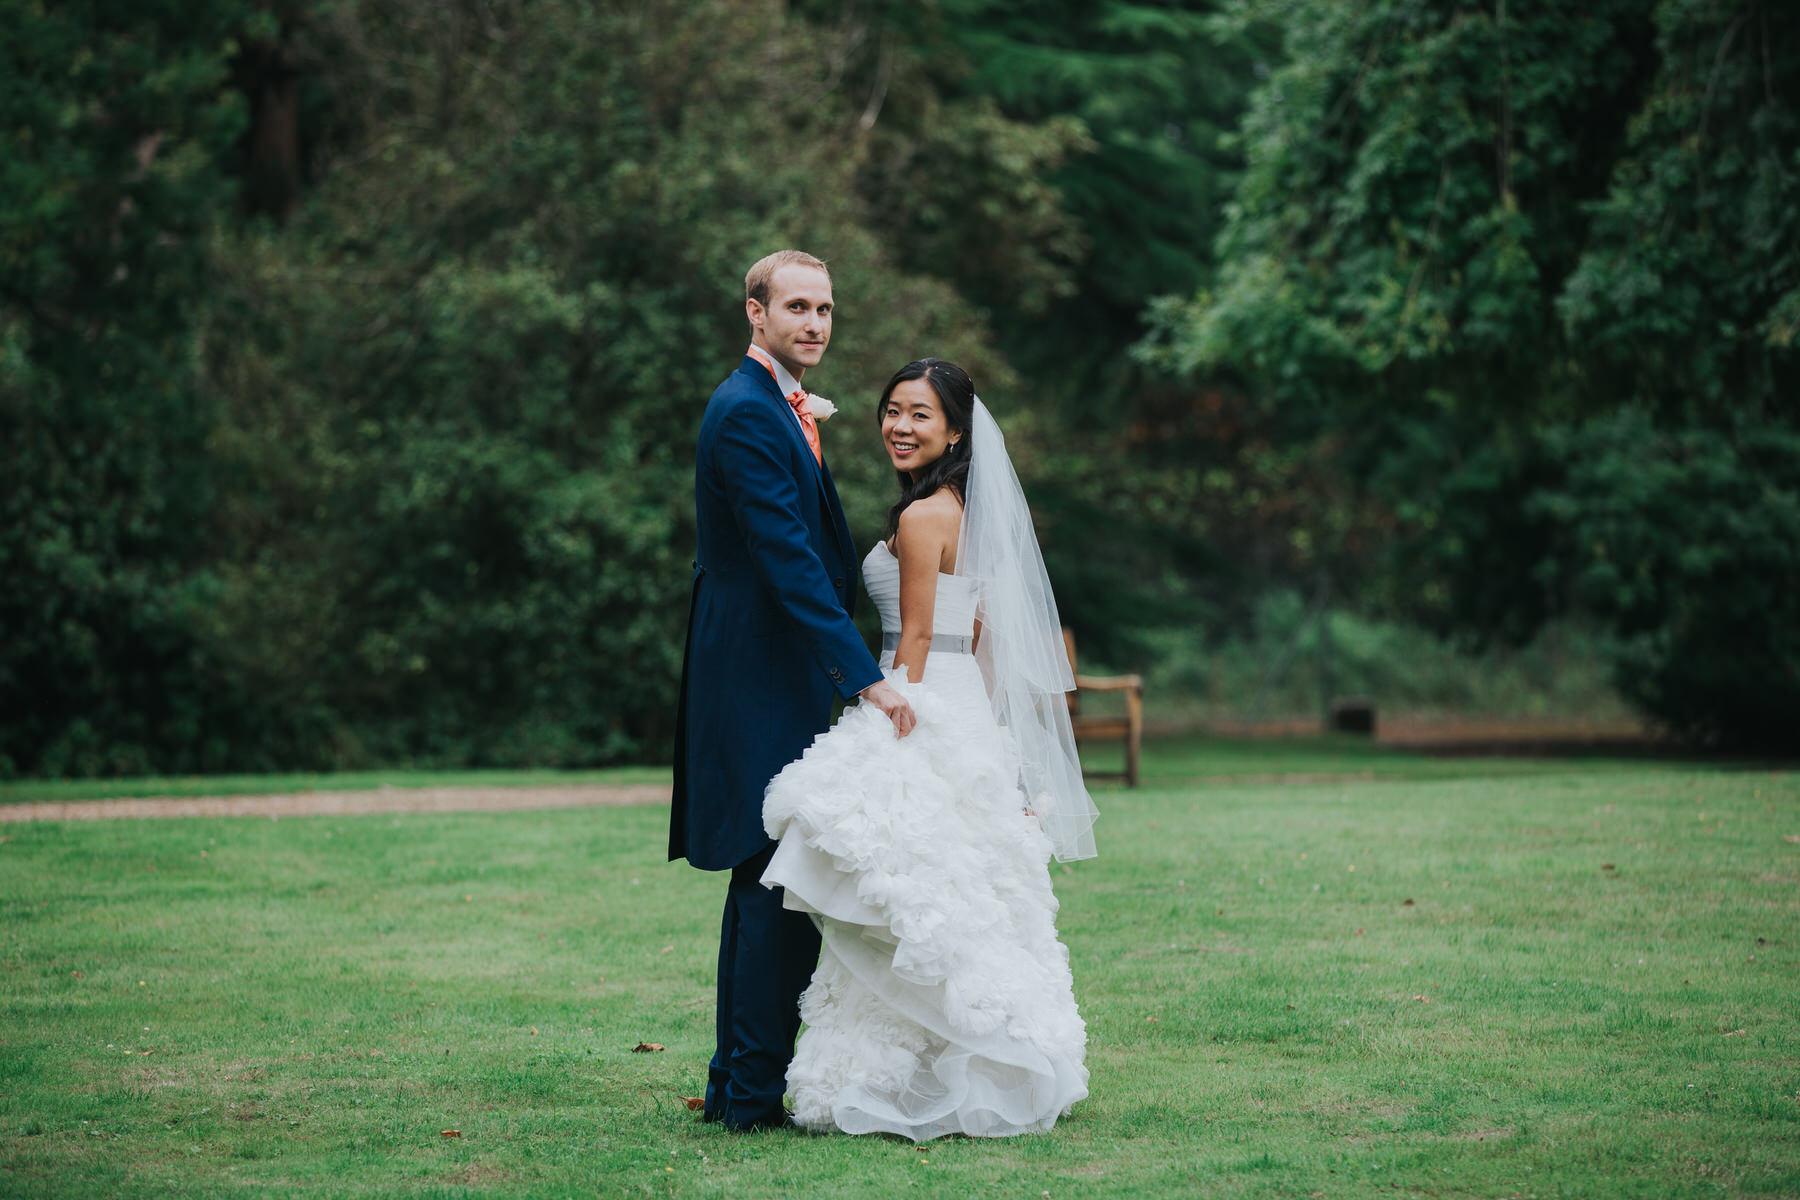 323 bride groom wedding portraits Woodlands Hotel grounds.jpg